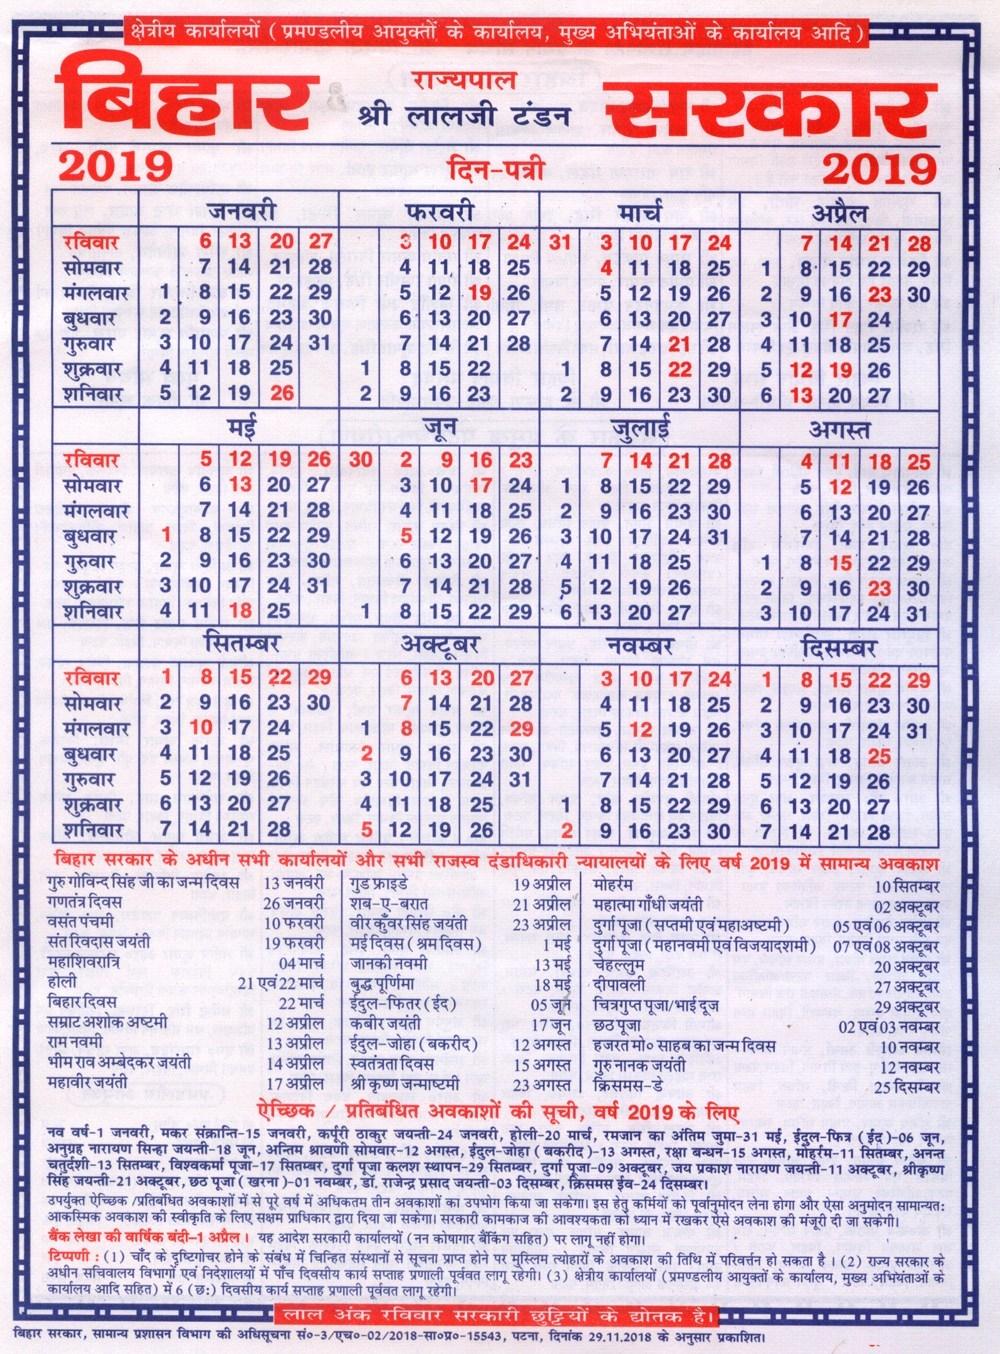 Bihar_Government_Calendar2019 | Bihar School intended for Government Calendar 2020 Bihar